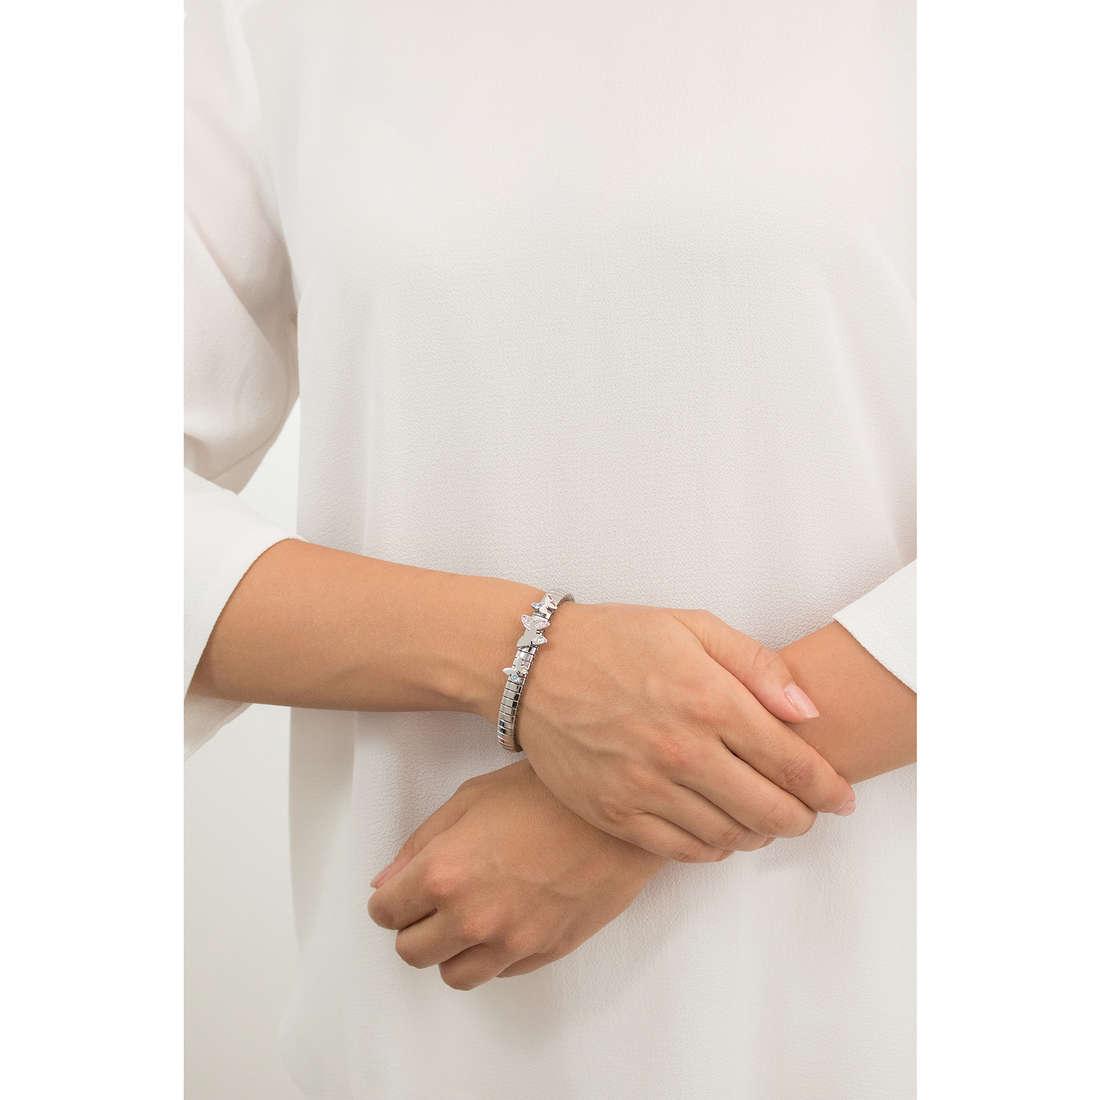 Nomination bracciali Butterfly donna 021300/005 indosso